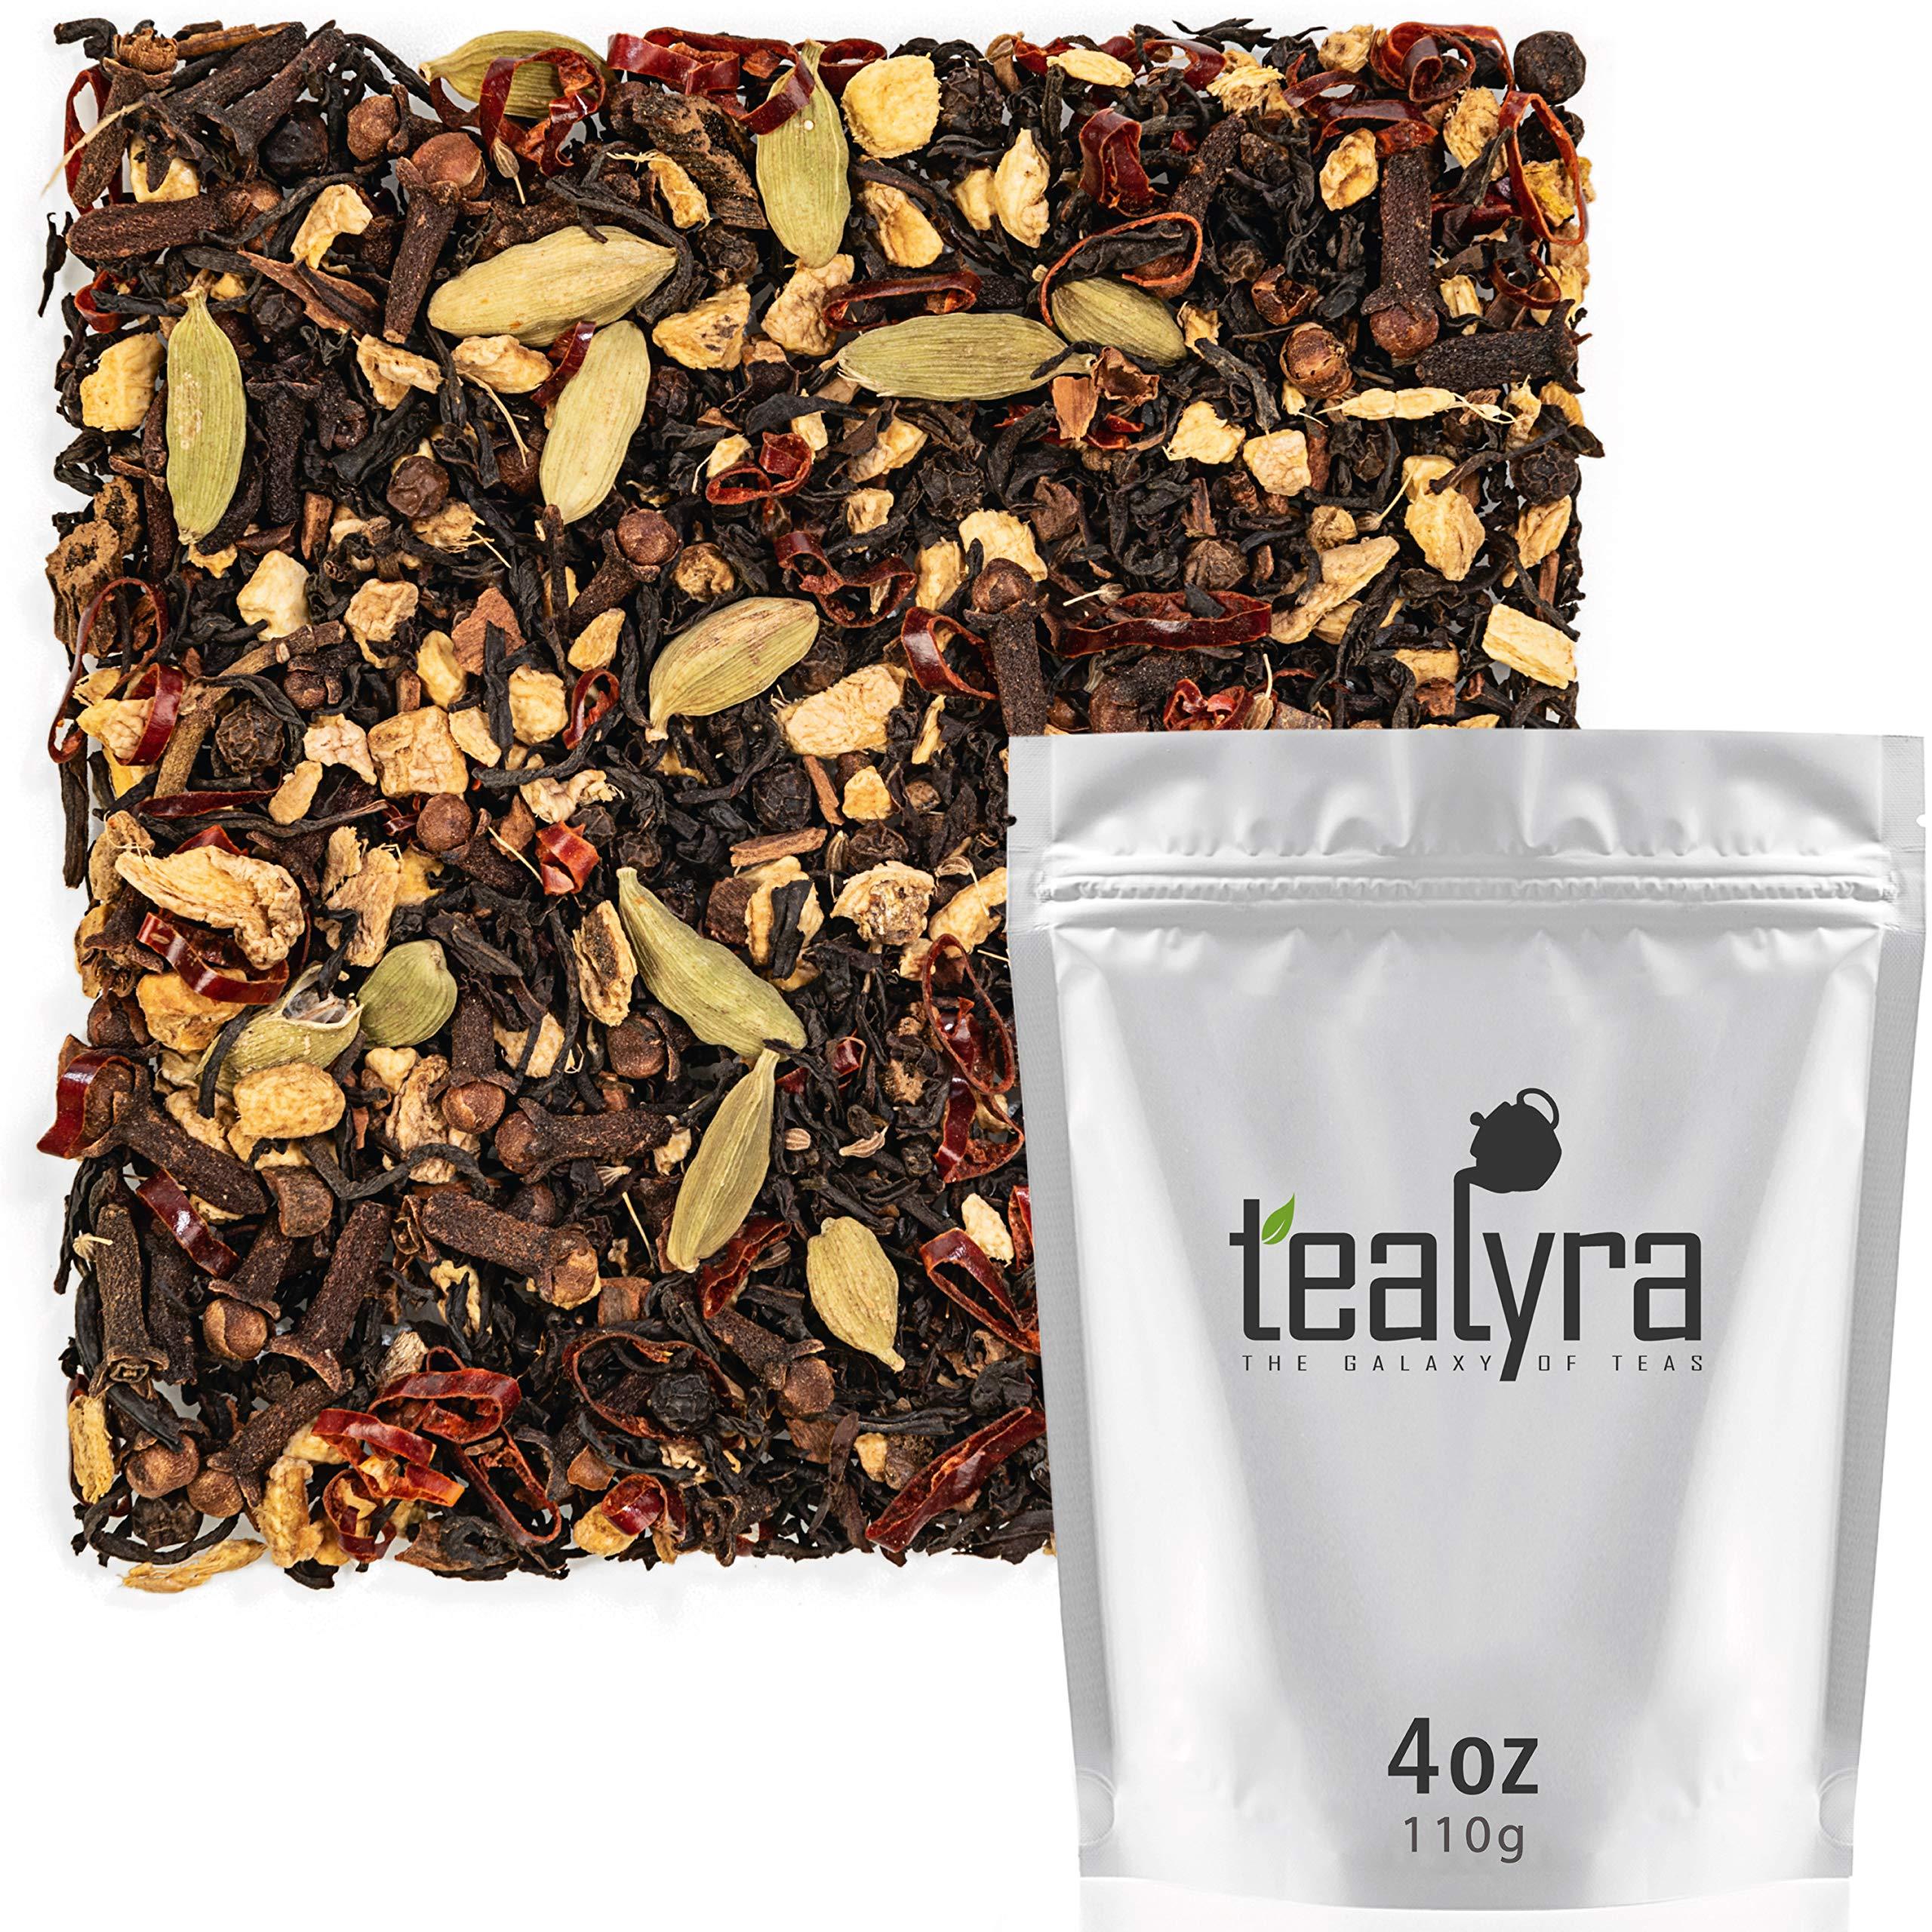 Tealyra - Spicy Chili Pepper Chai - Black Tea - Ginger - Cardamom - Cinnamon - Vanilla - Warm Spicy Loose Leaf Tea - 112g (4-ounce)